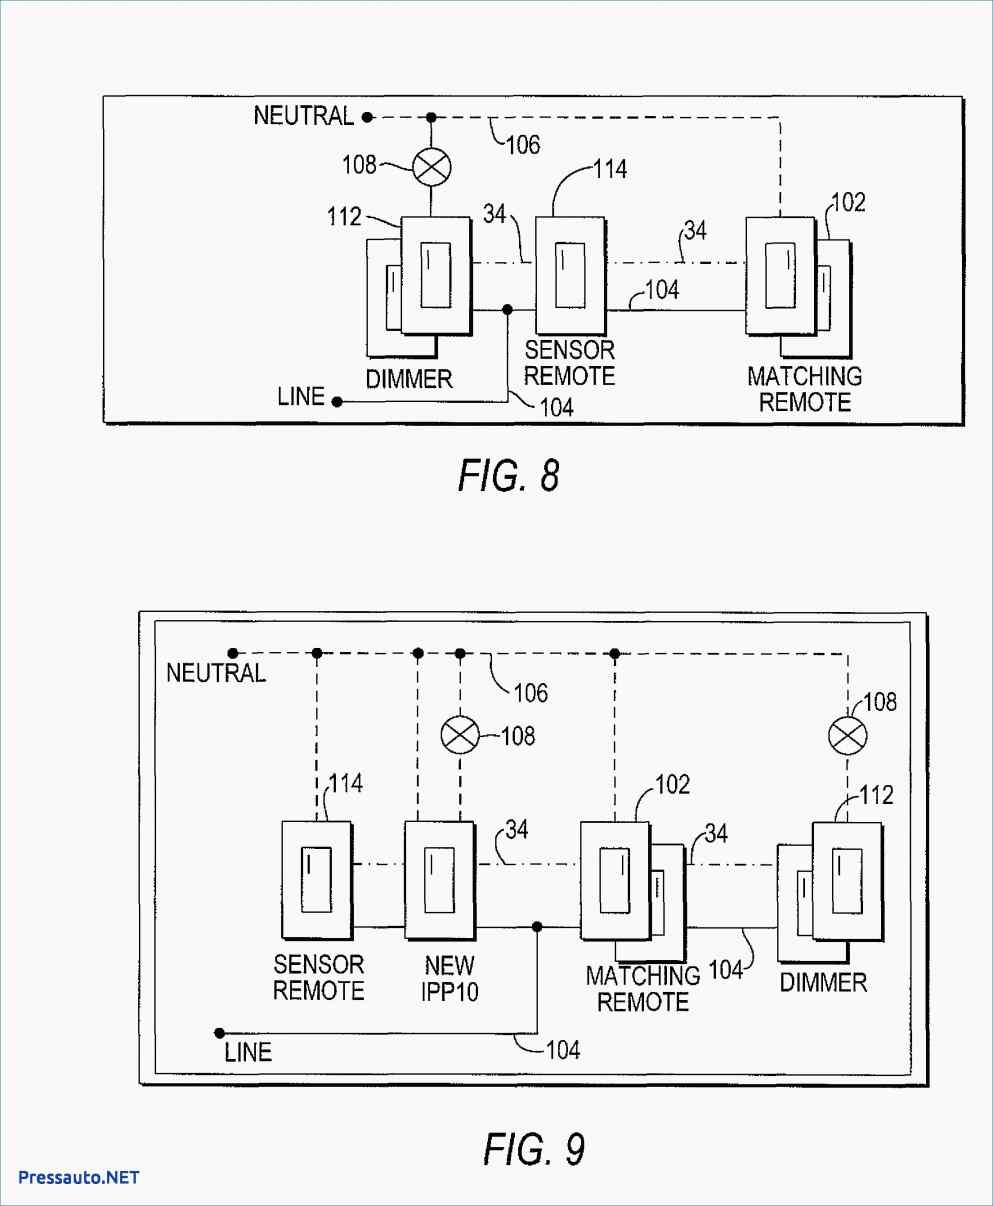 lutron 3 way dimmer wiring diagram Download-Wiring Diagram 3 Way Switch Beautiful Lutron Diva 3 Way Dimmer Wiring Diagram Wiring 7-l